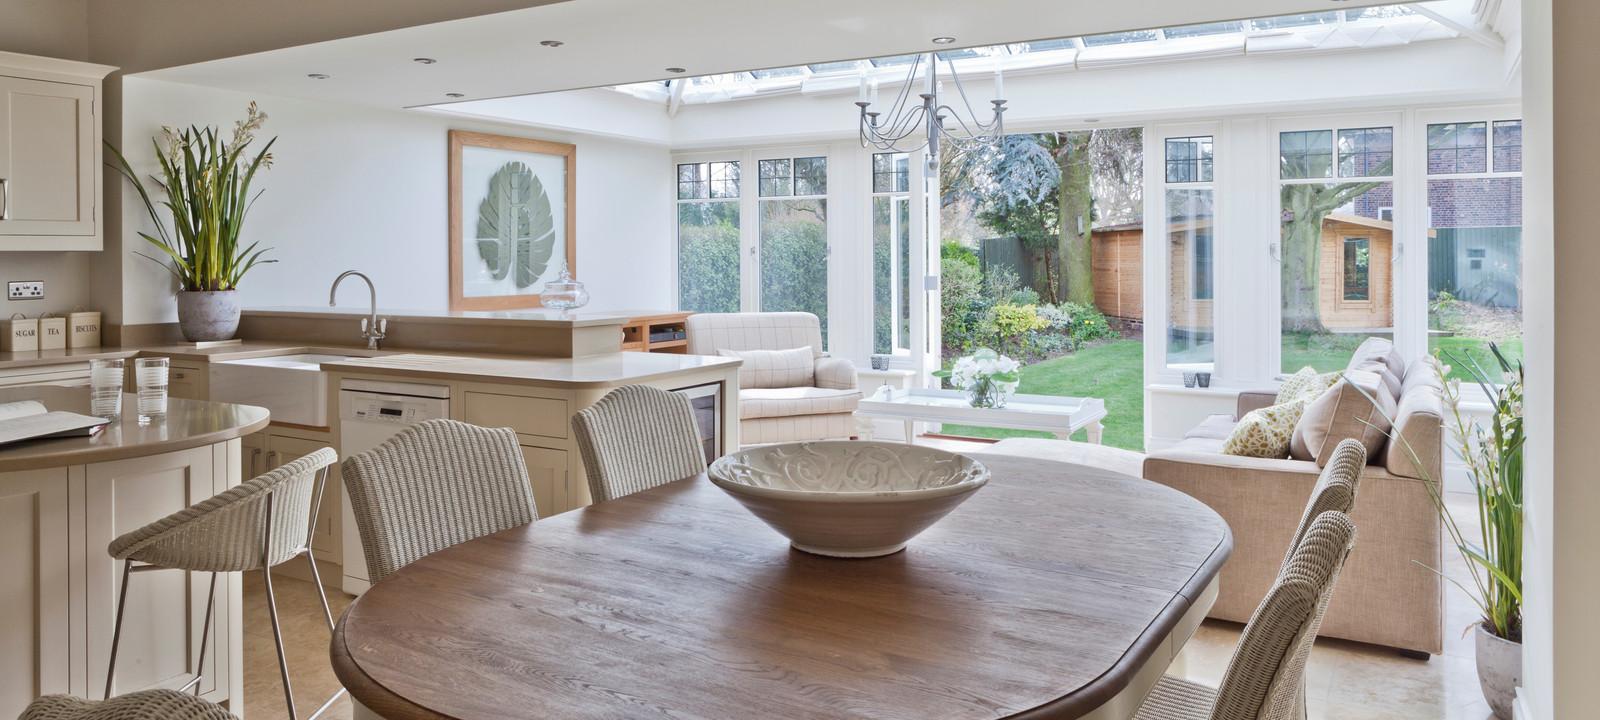 Cindy De Vos interior Design